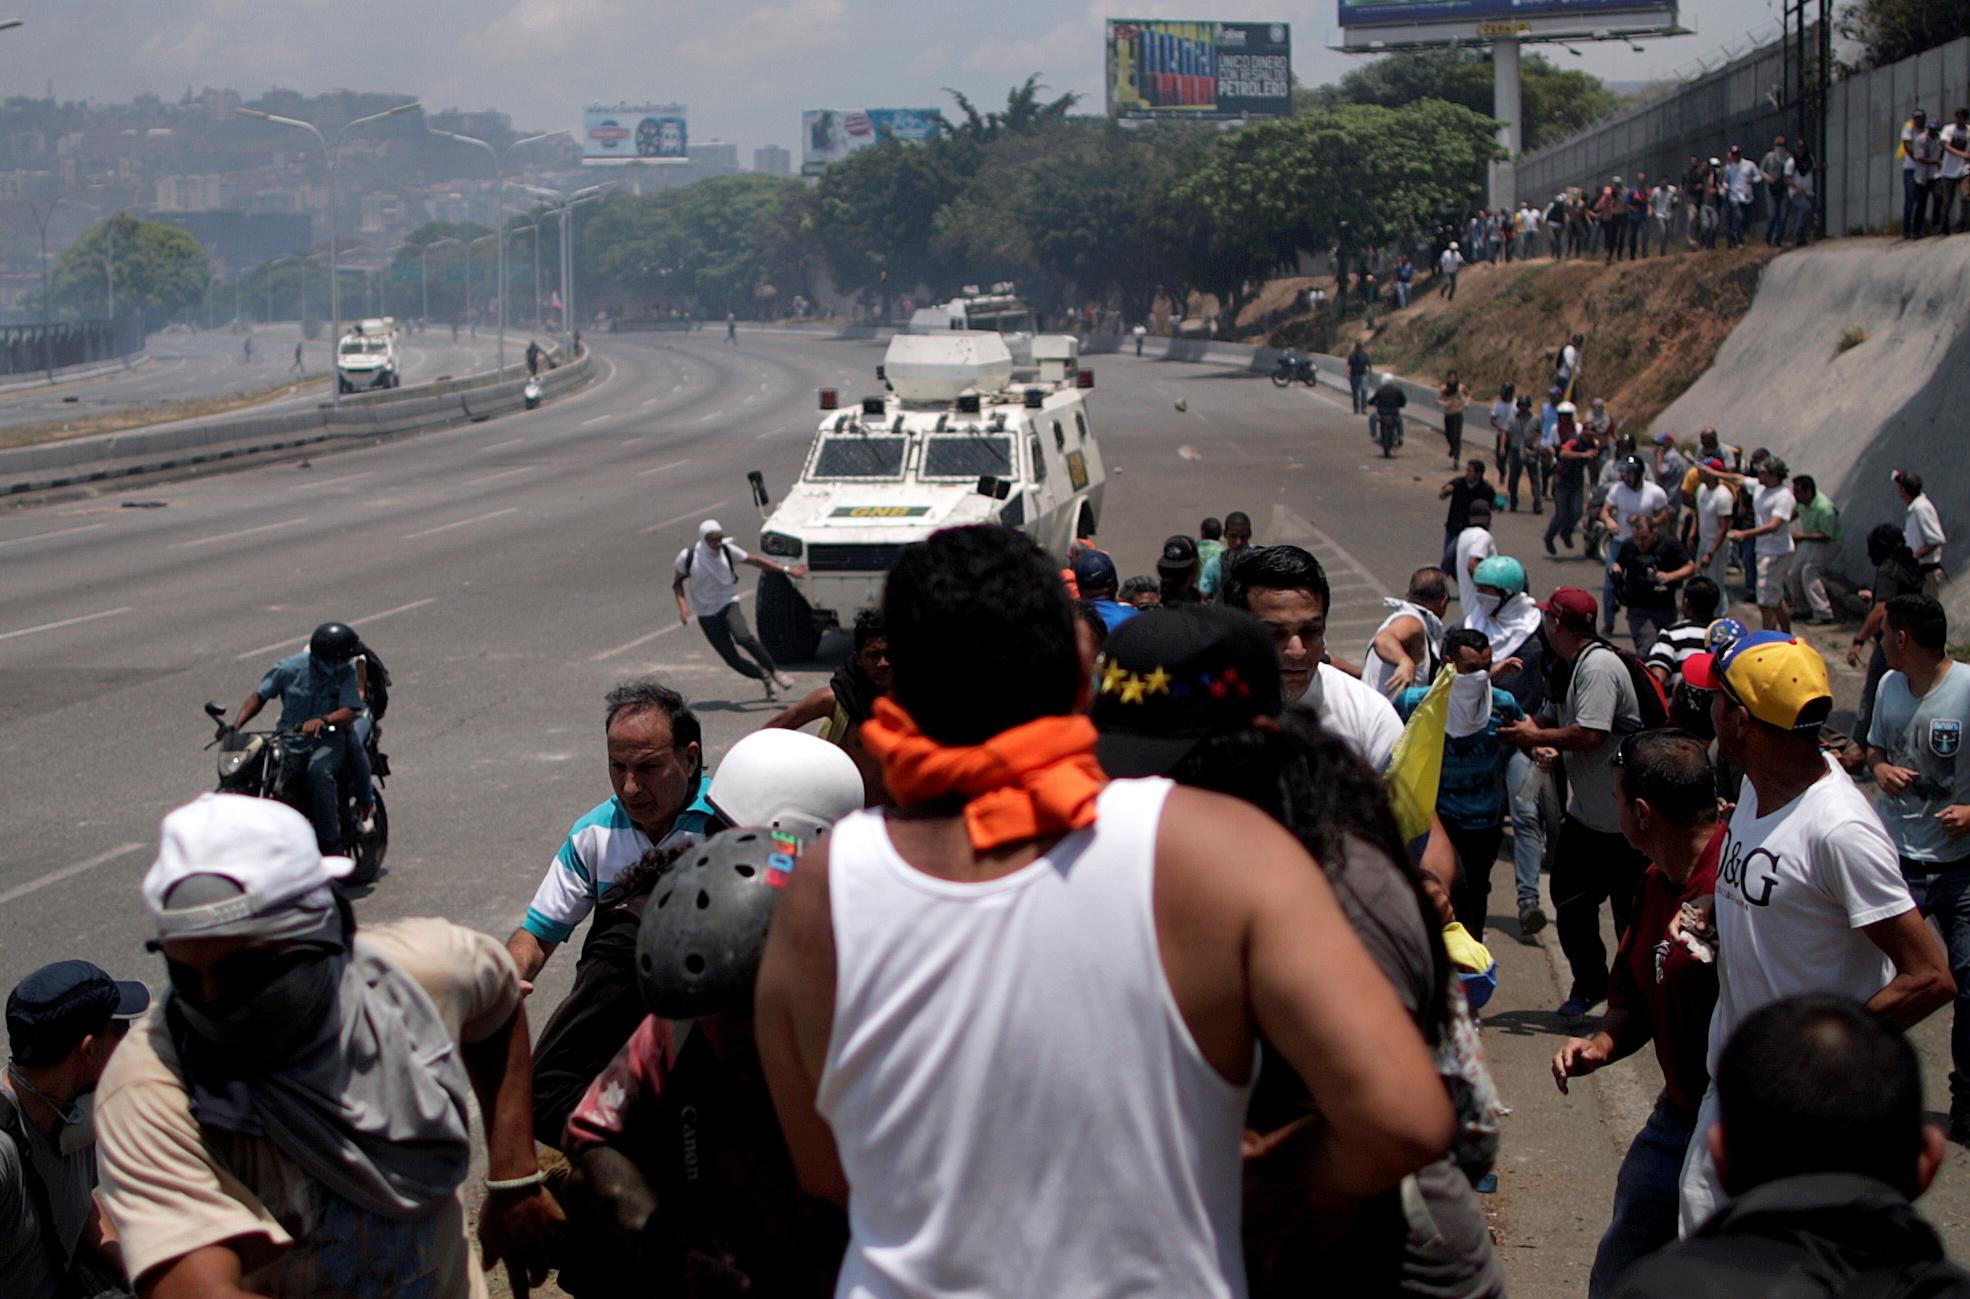 Tanquetas militares arrollan a manifestantes en Venezuela